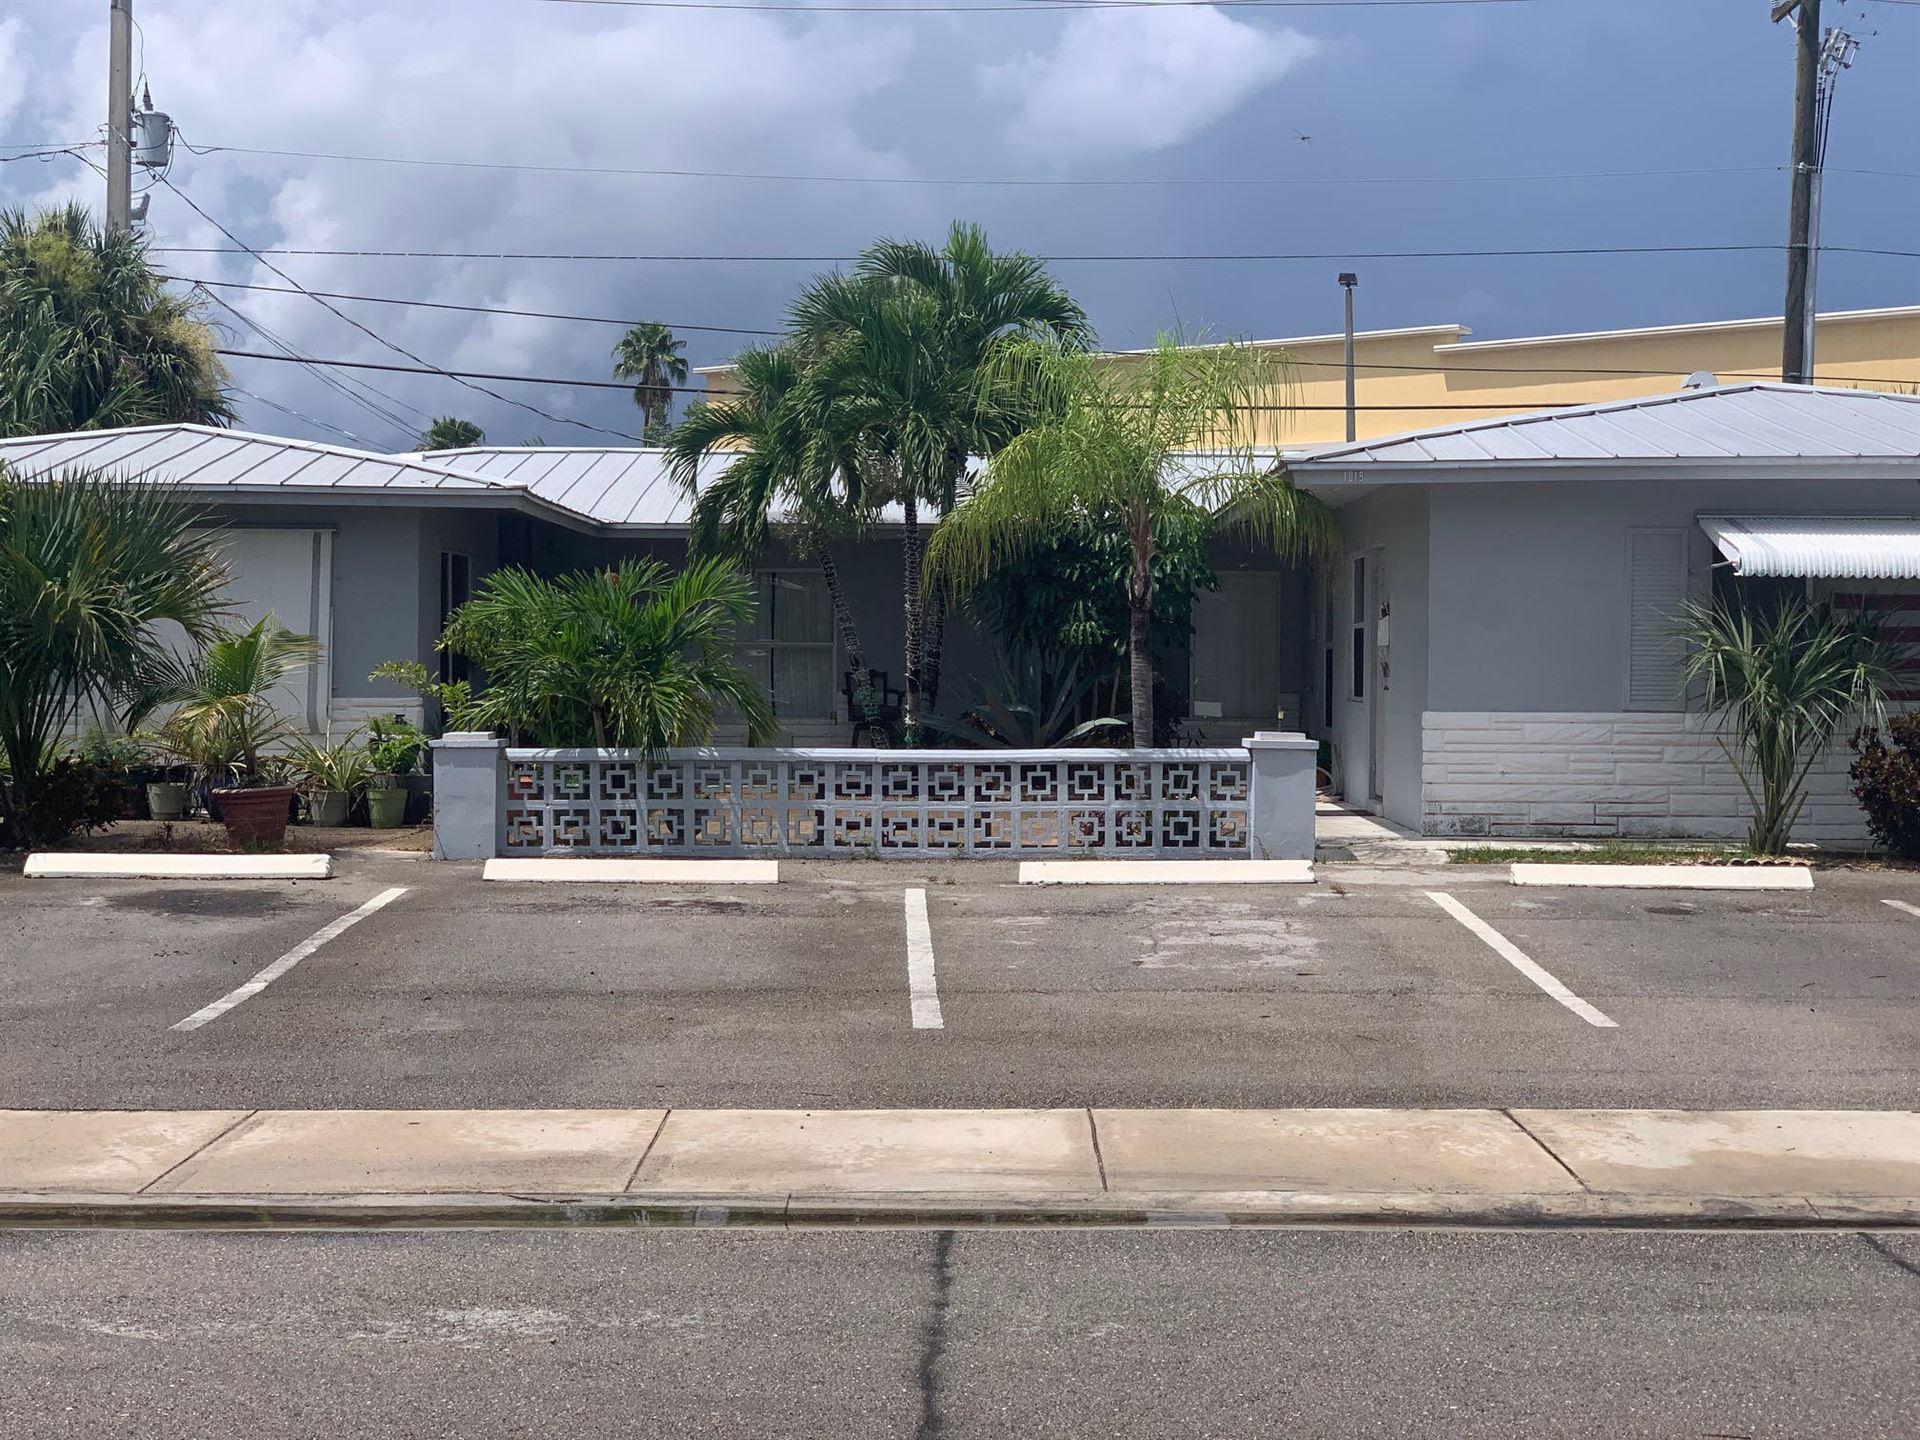 1019 SE 3rd Street, Deerfield Beach, FL 33441 - #: RX-10644255